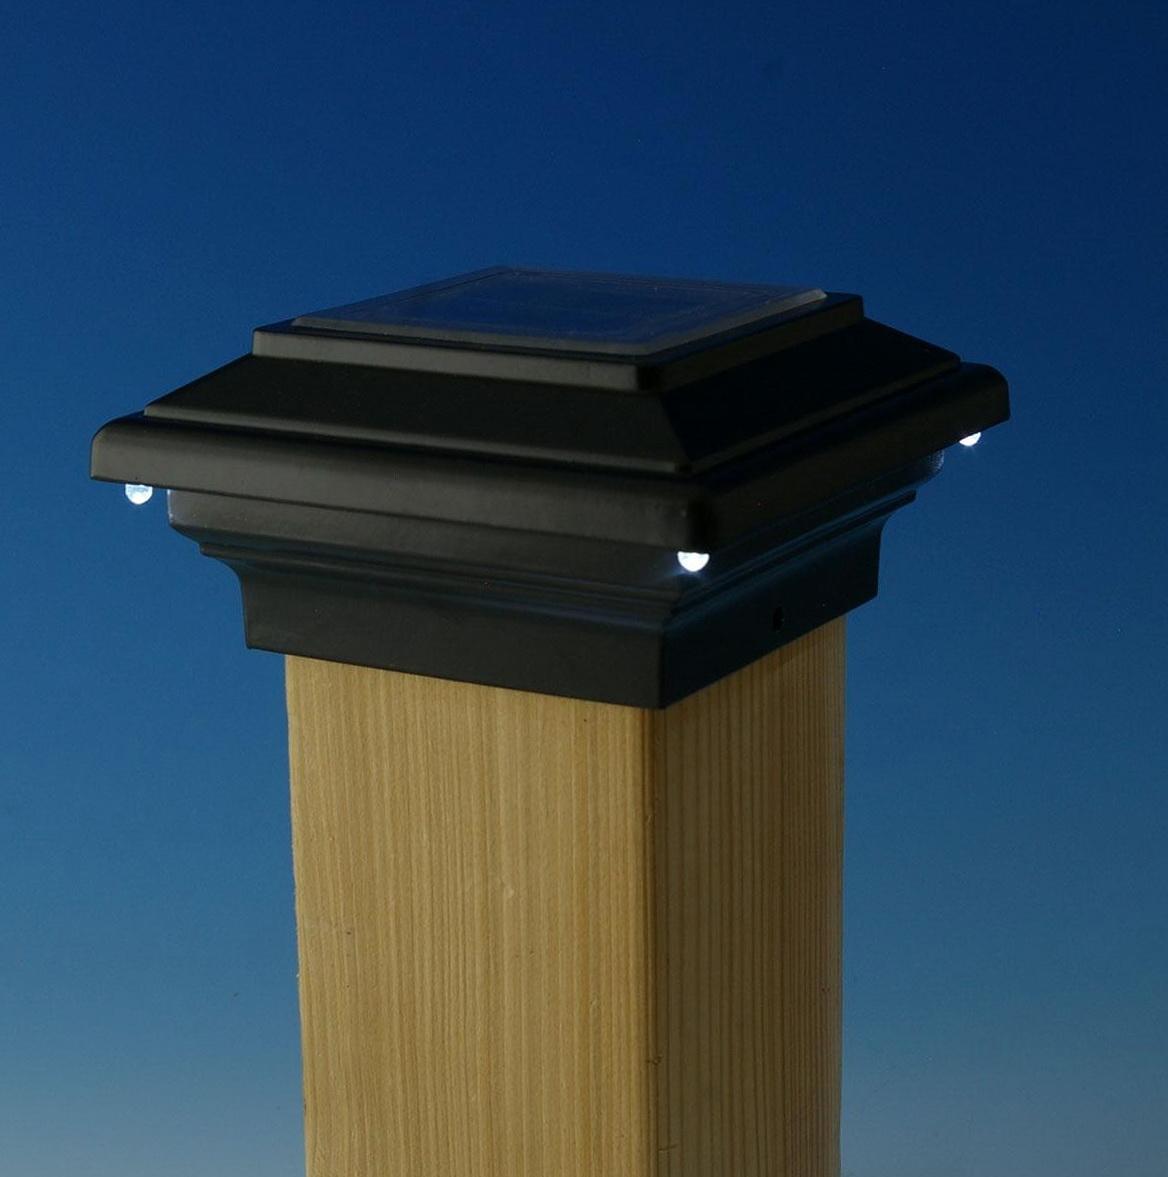 Solar Deck Lighting Post Caps